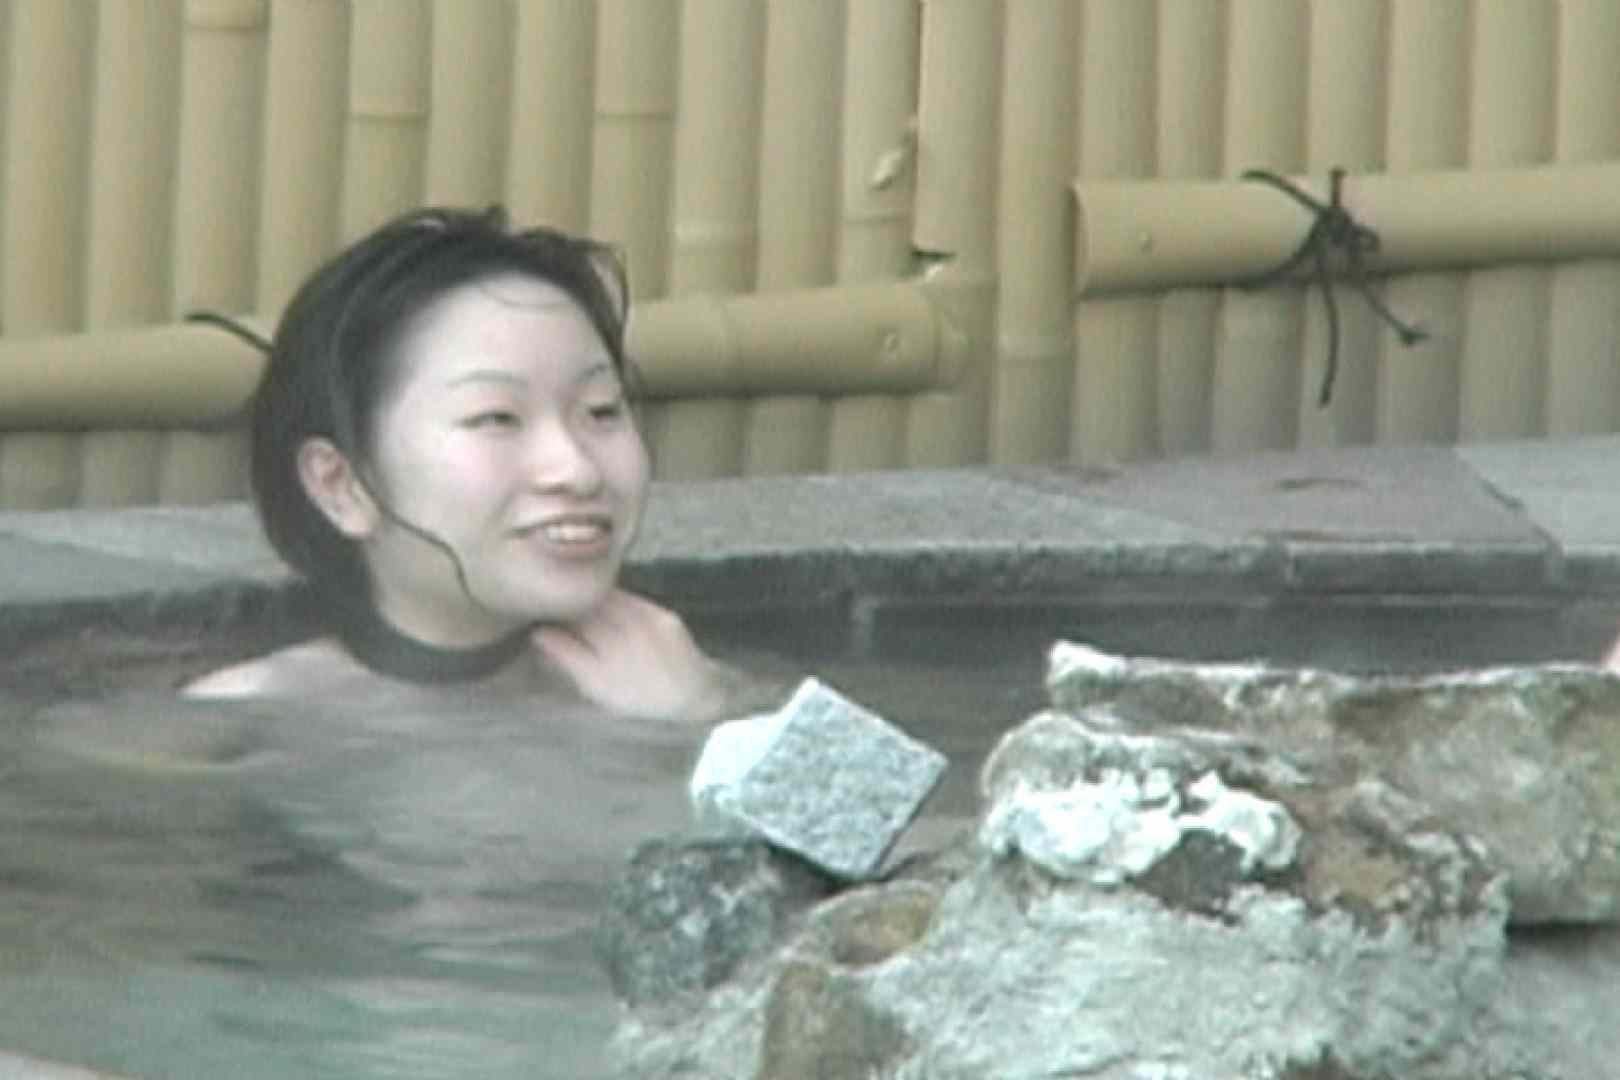 Aquaな露天風呂Vol.595 HなOL | 露天  65pic 59